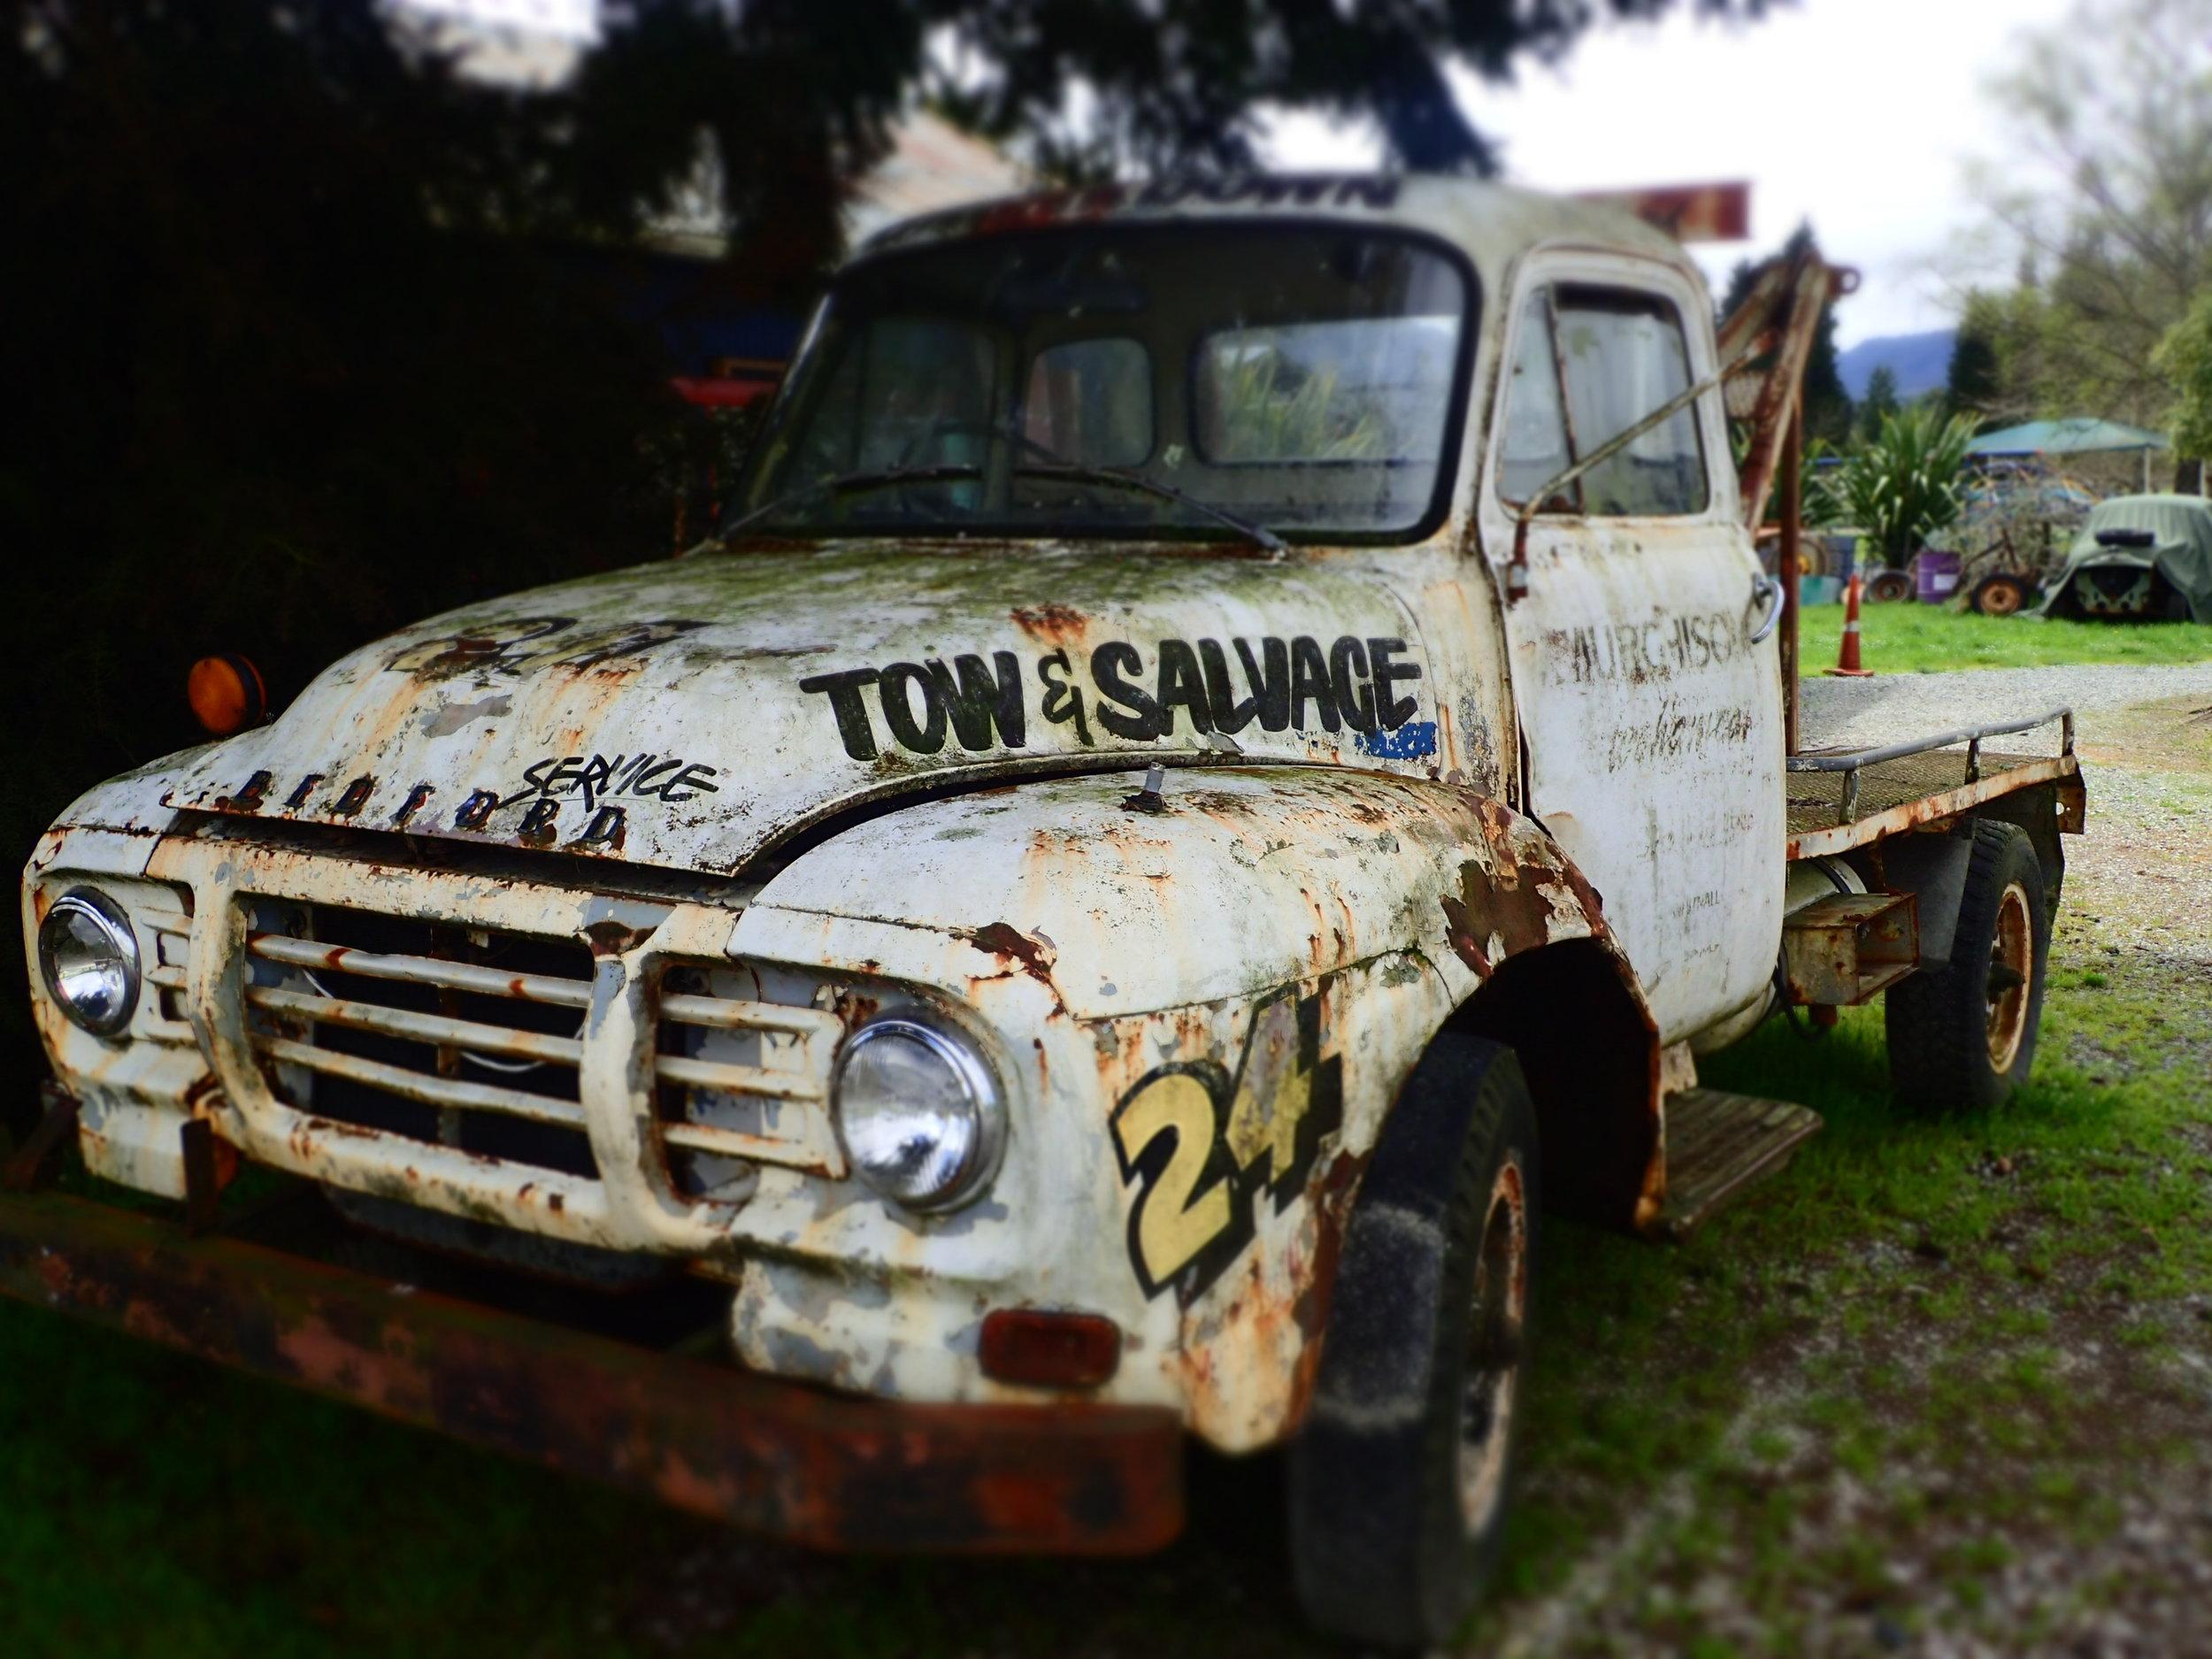 Classic kiwi Bedford tow truck